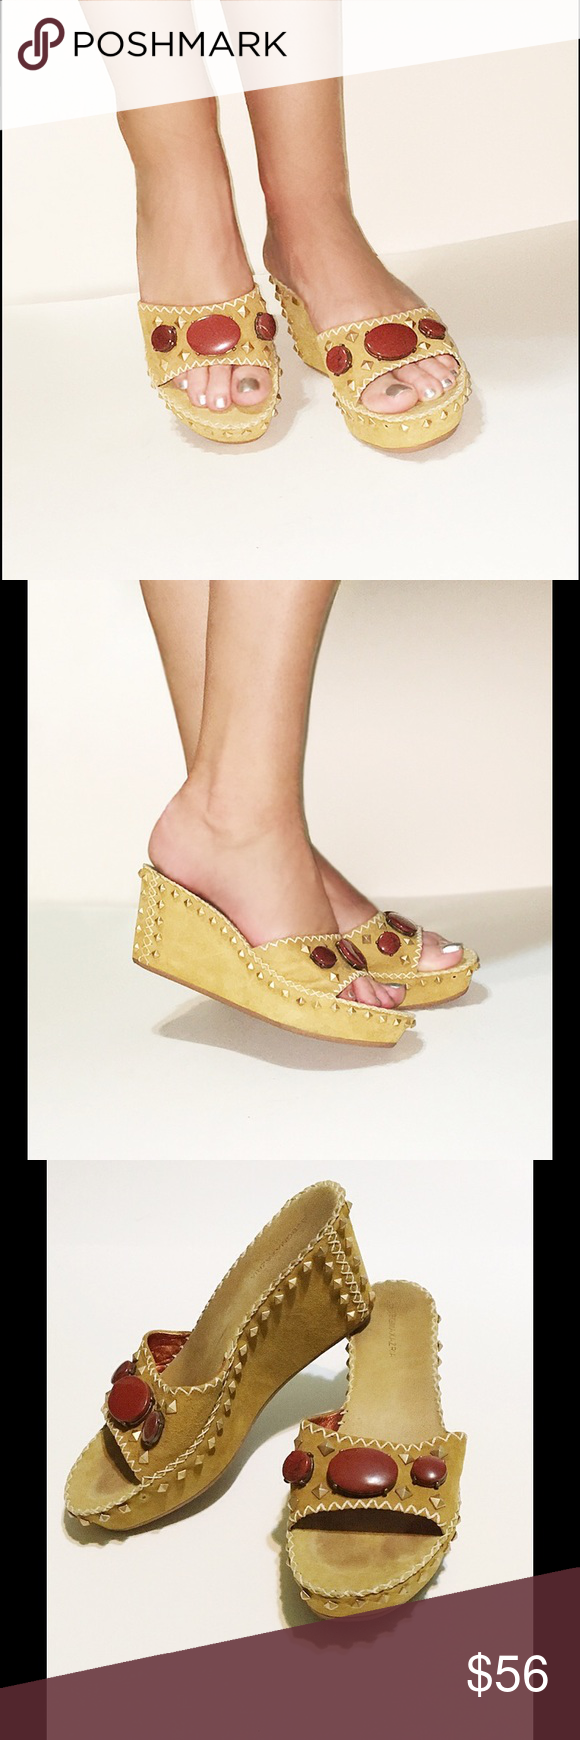 eec5d21c5eab28 Bcbg wedge platform suede sandals studs gemstone shoes pic tan png 580x1740  Bcbg natural heels